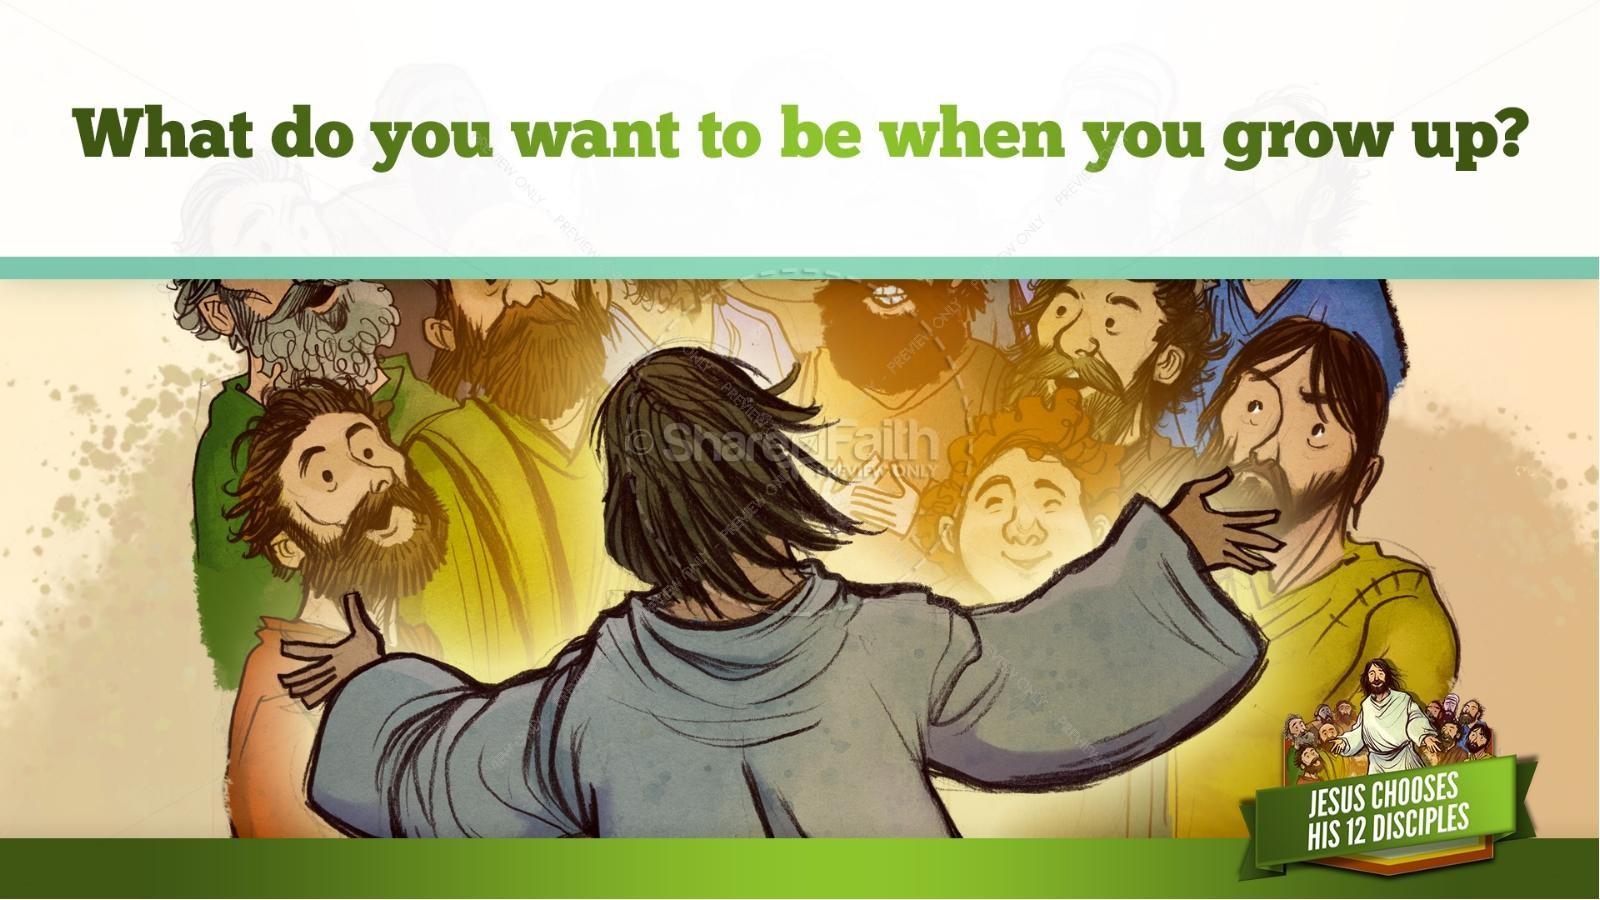 Jesus Chooses His 12 Disciples Kids Bible Story | slide 32